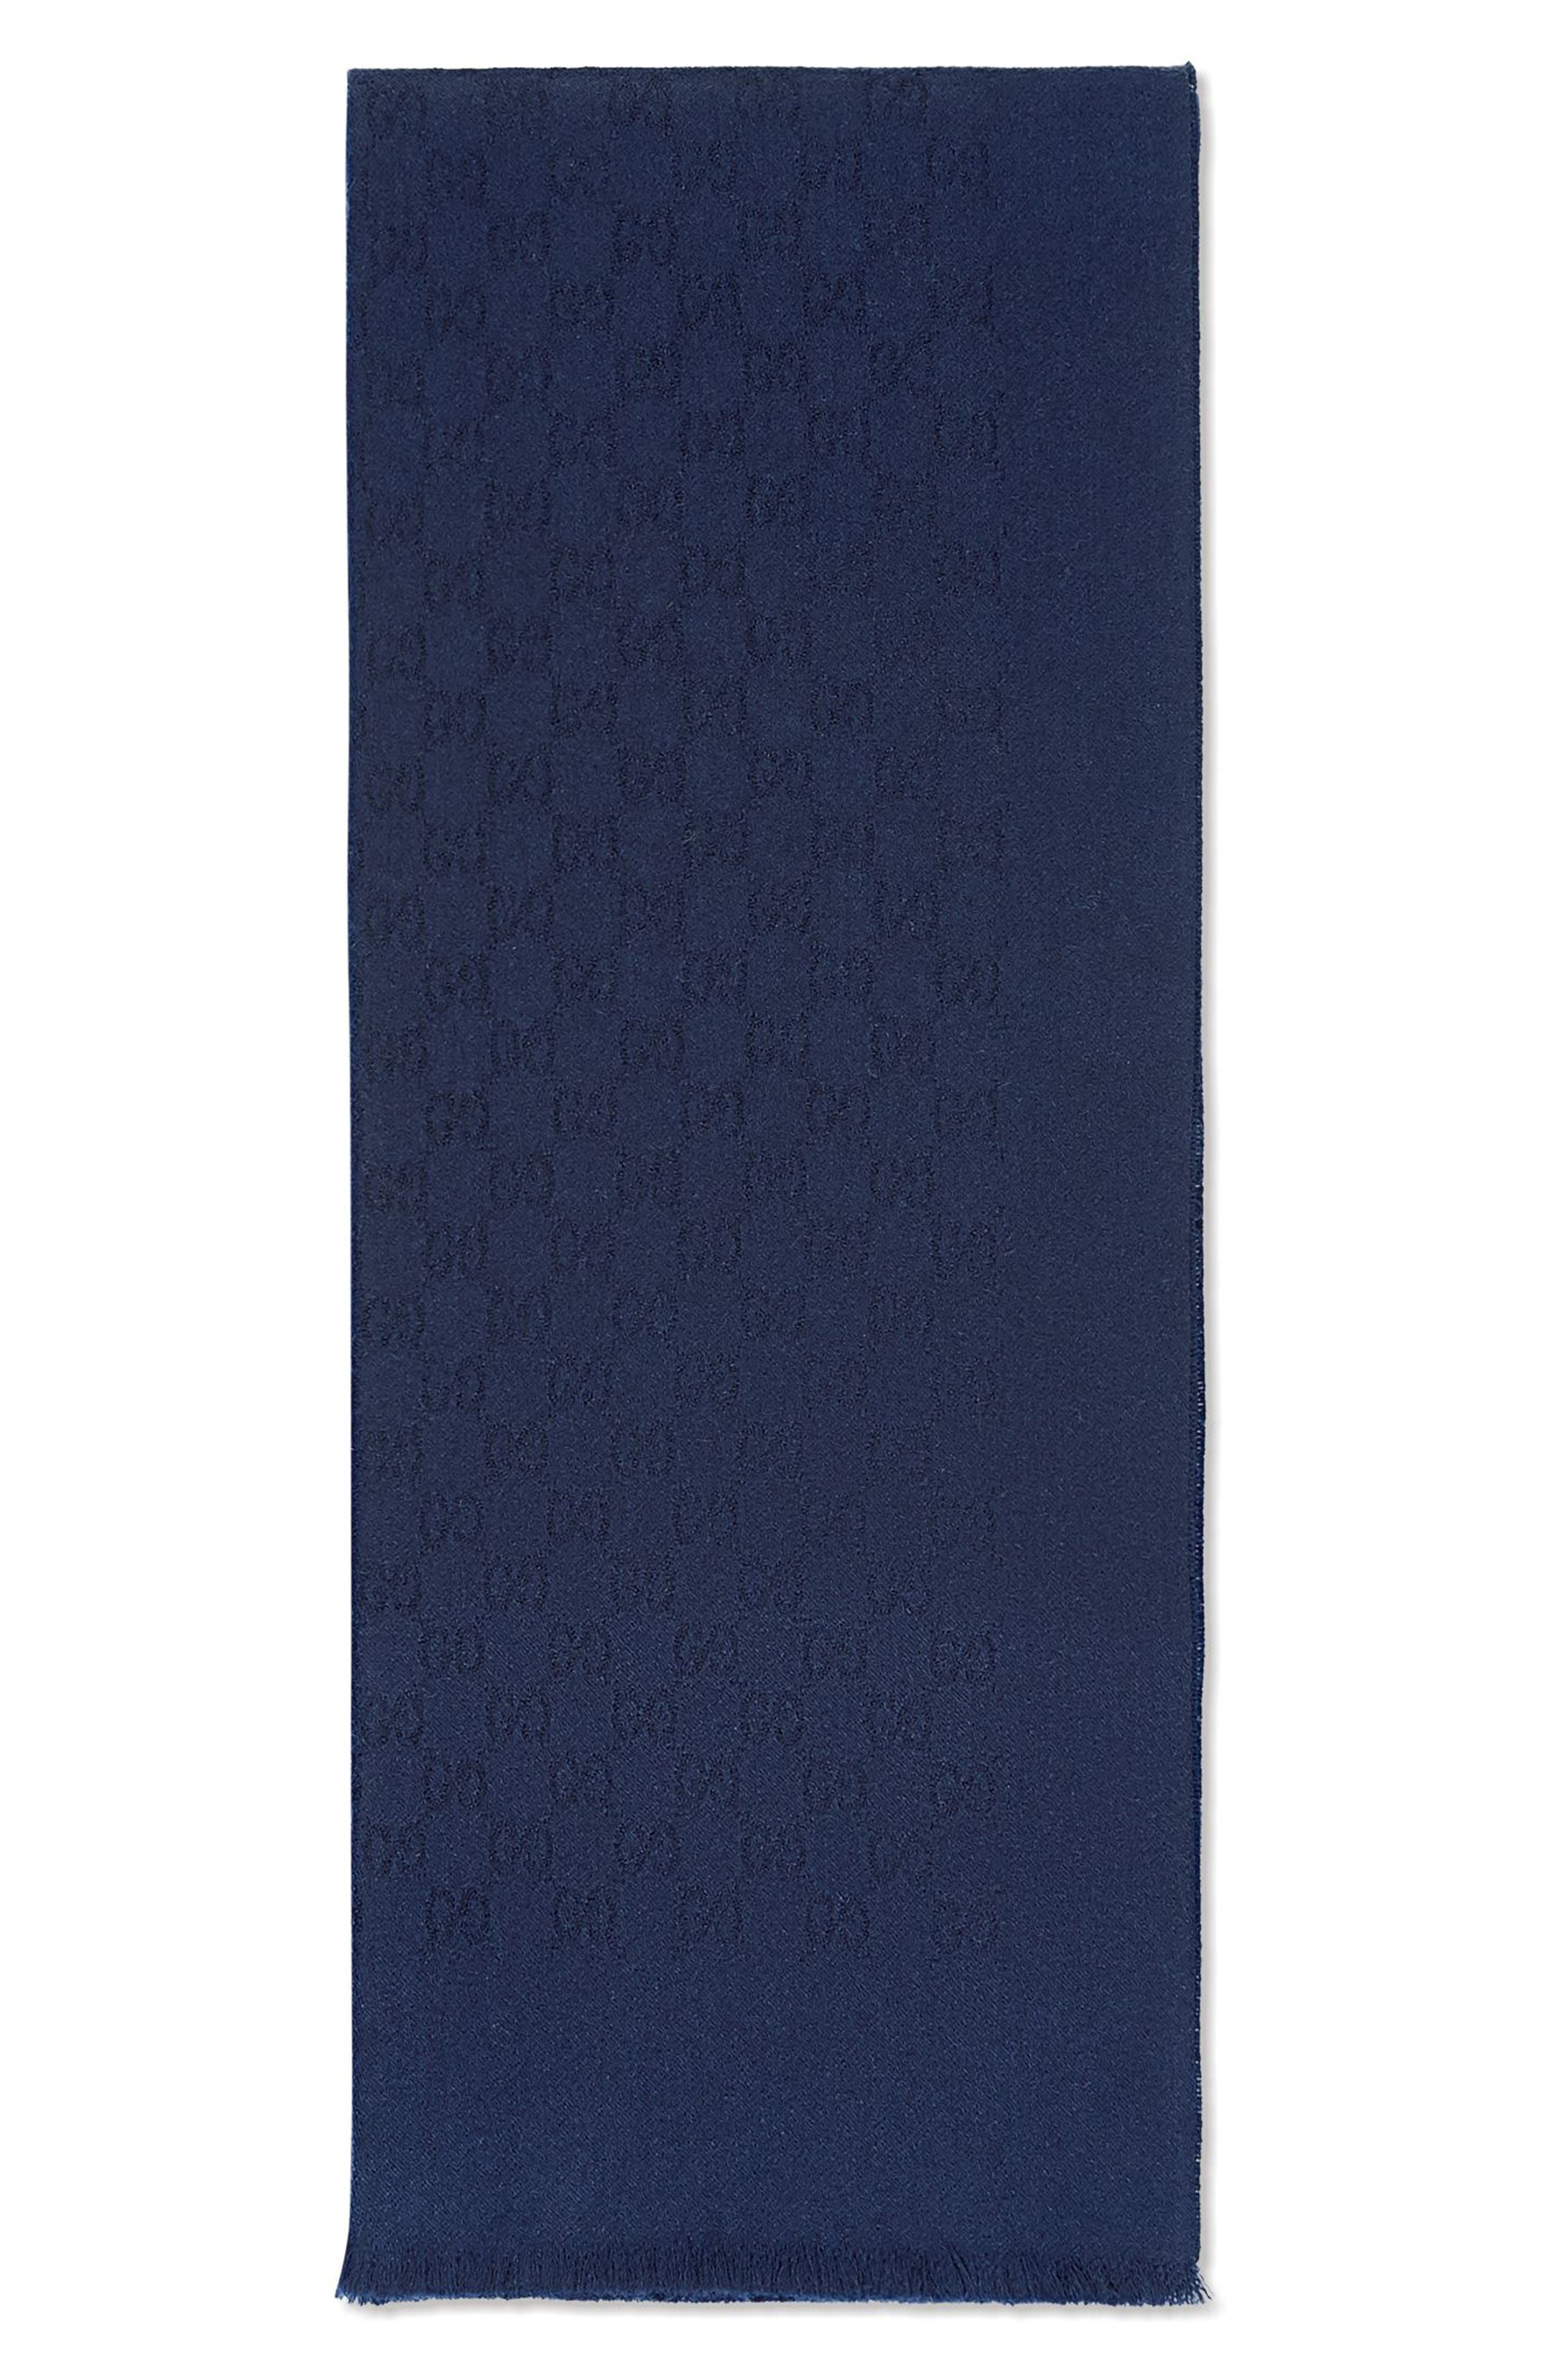 GG Gem Lux Jacquard Cashmere Scarf,                         Main,                         color, 4000 Midnight Blue